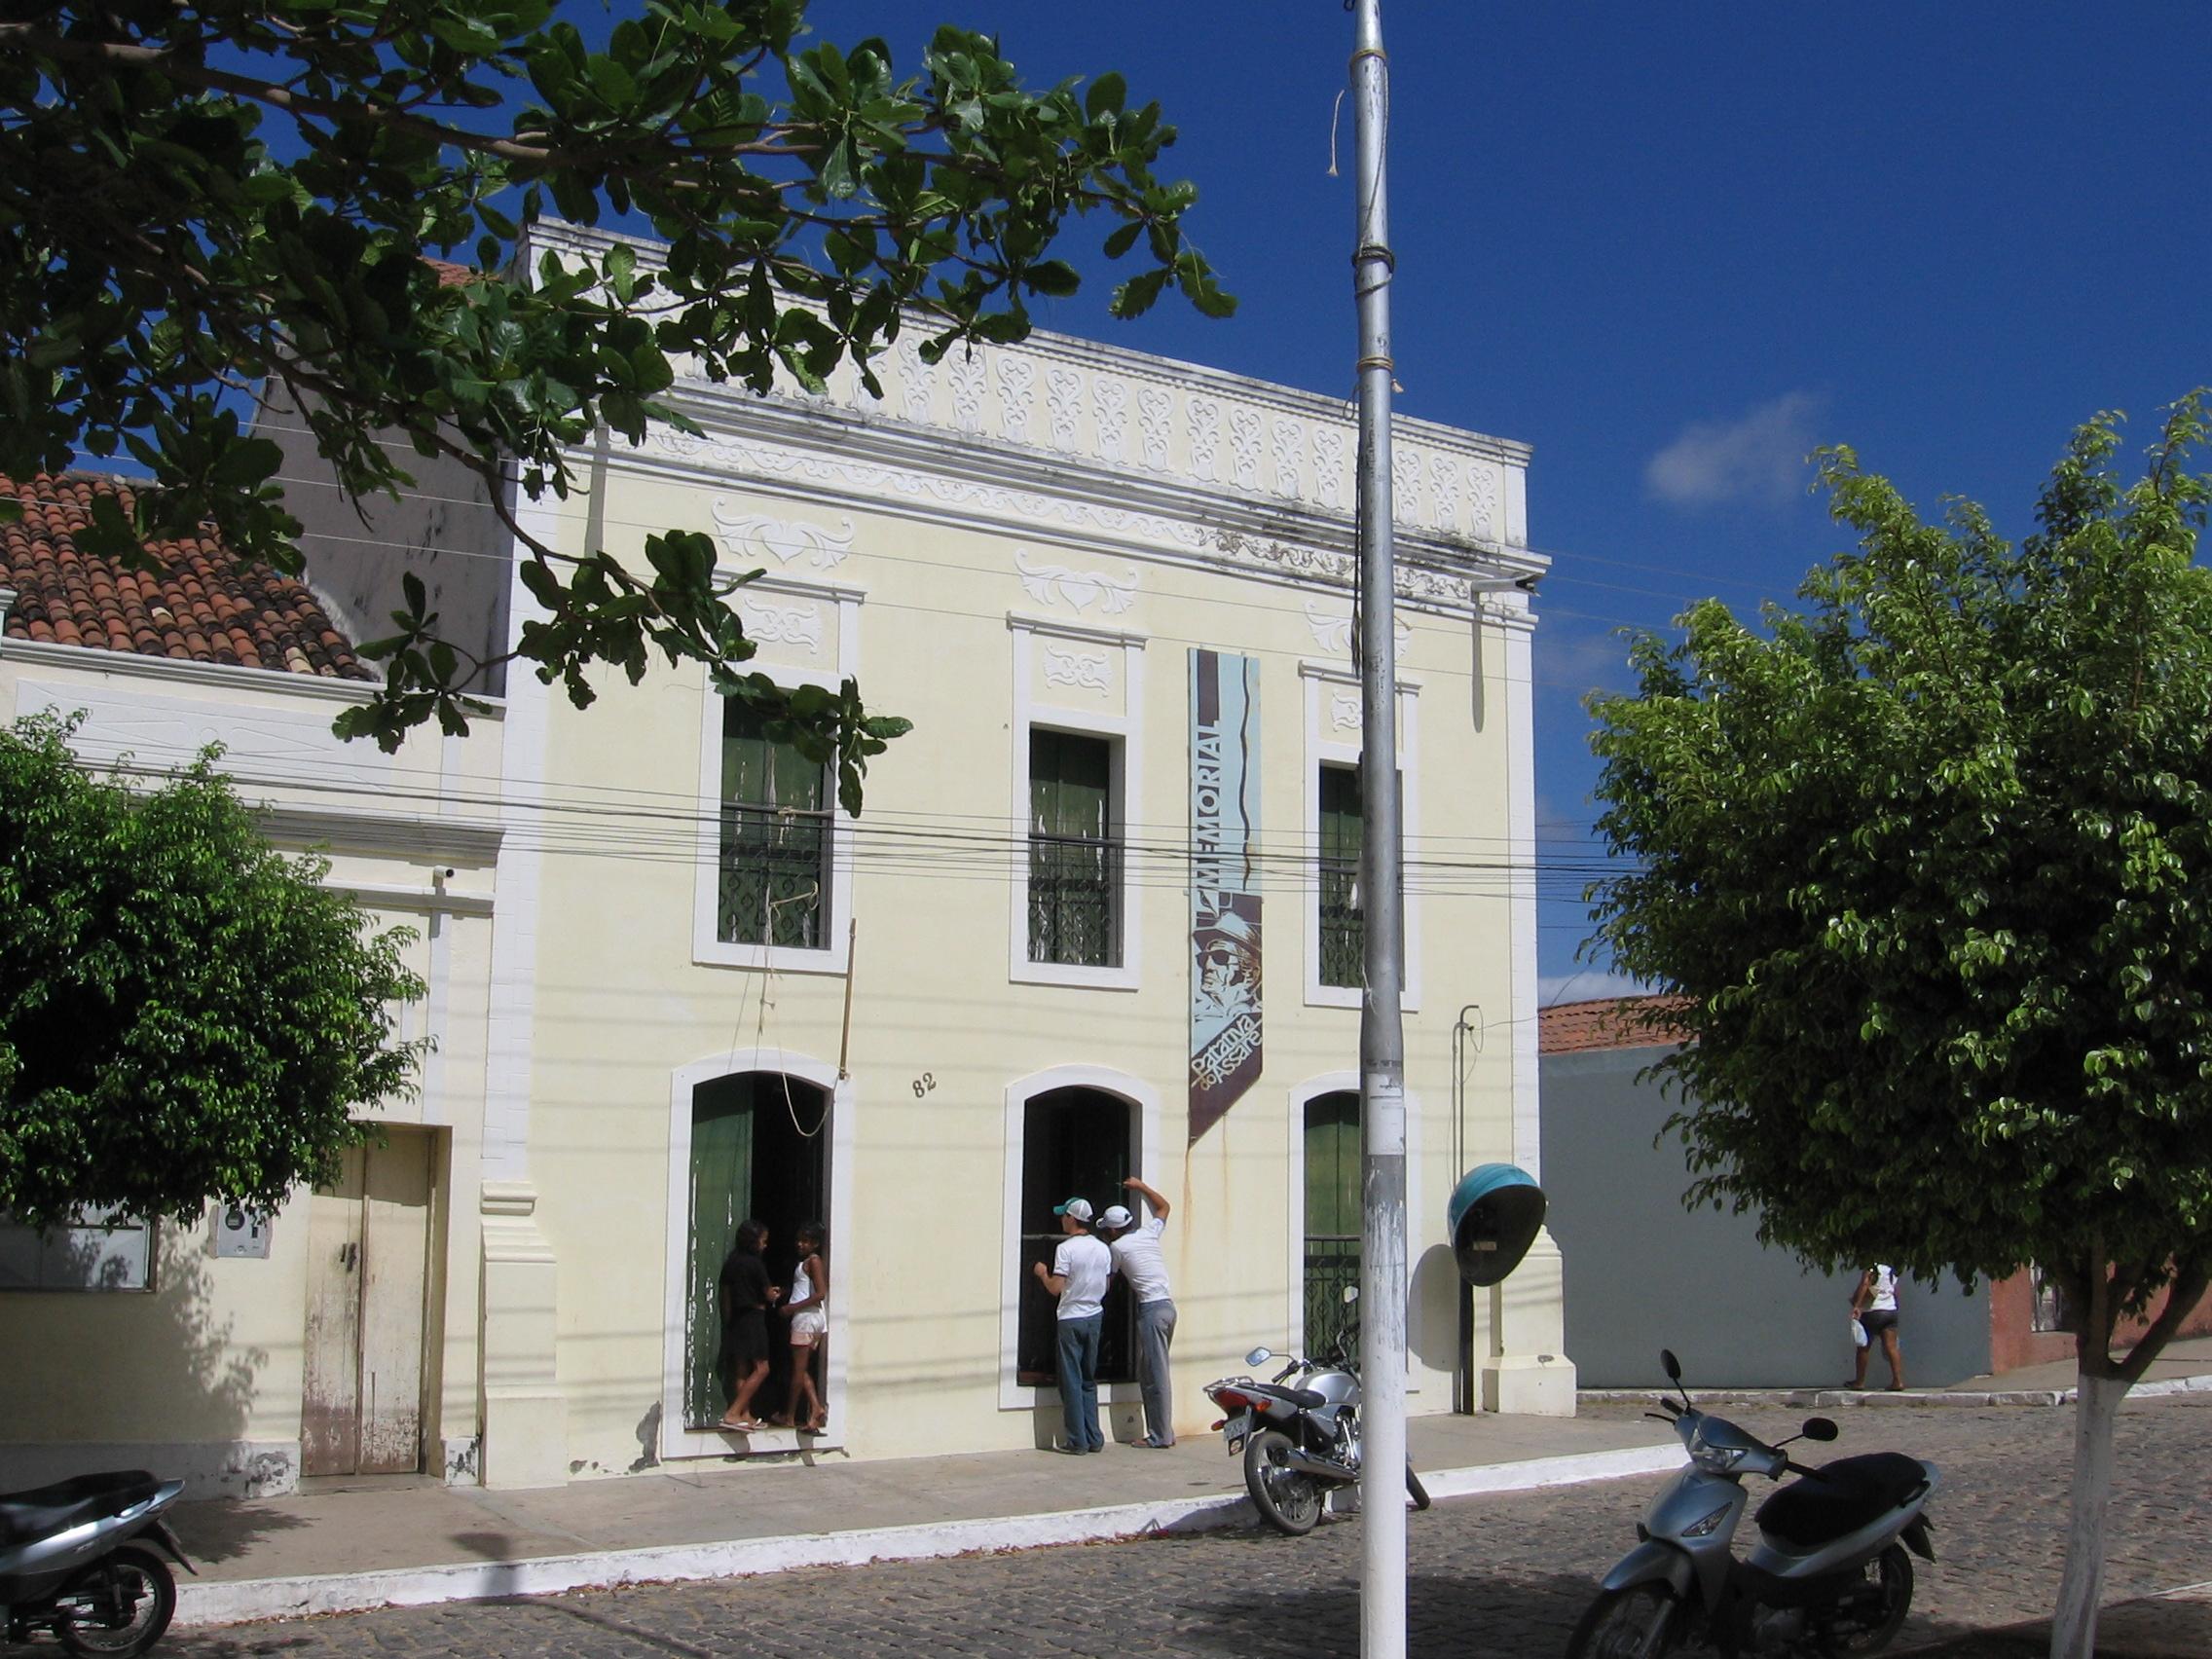 Assaré Ceará fonte: upload.wikimedia.org